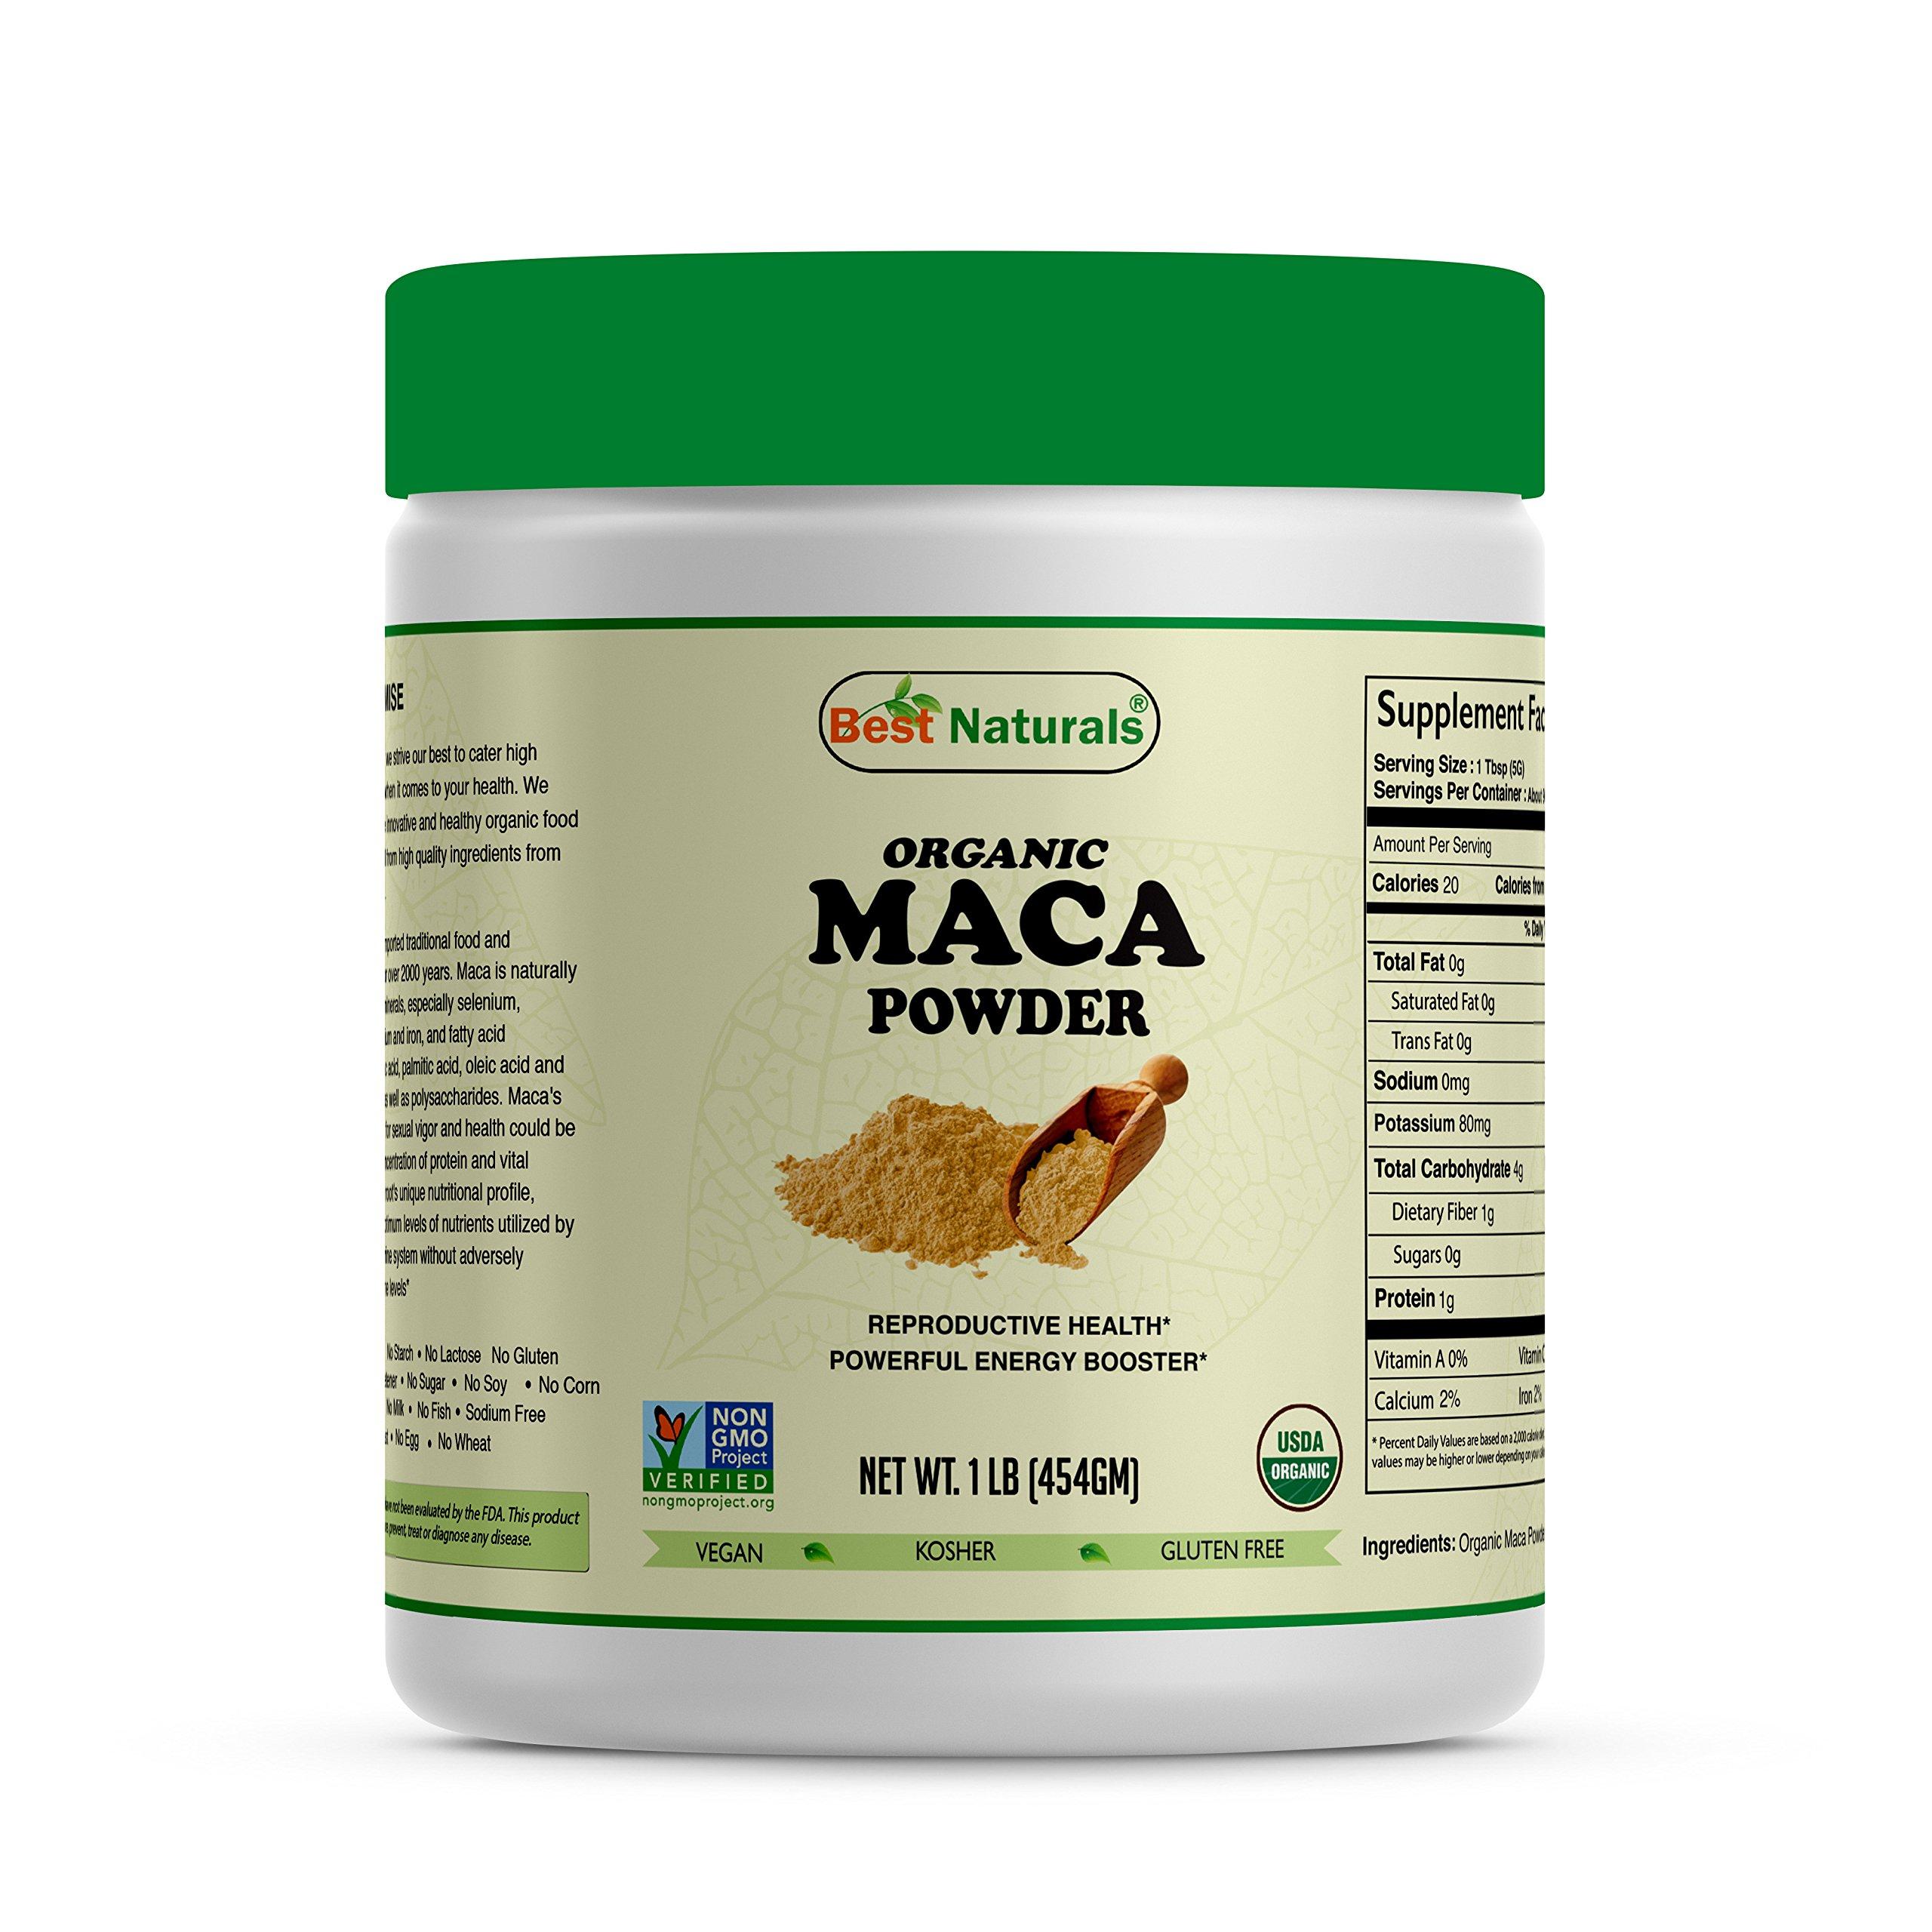 Best Naturals Certified Organic Maca Root Powder 1 lb (454 Gram), Non-GMO Project Verified & USDA Certified Organic